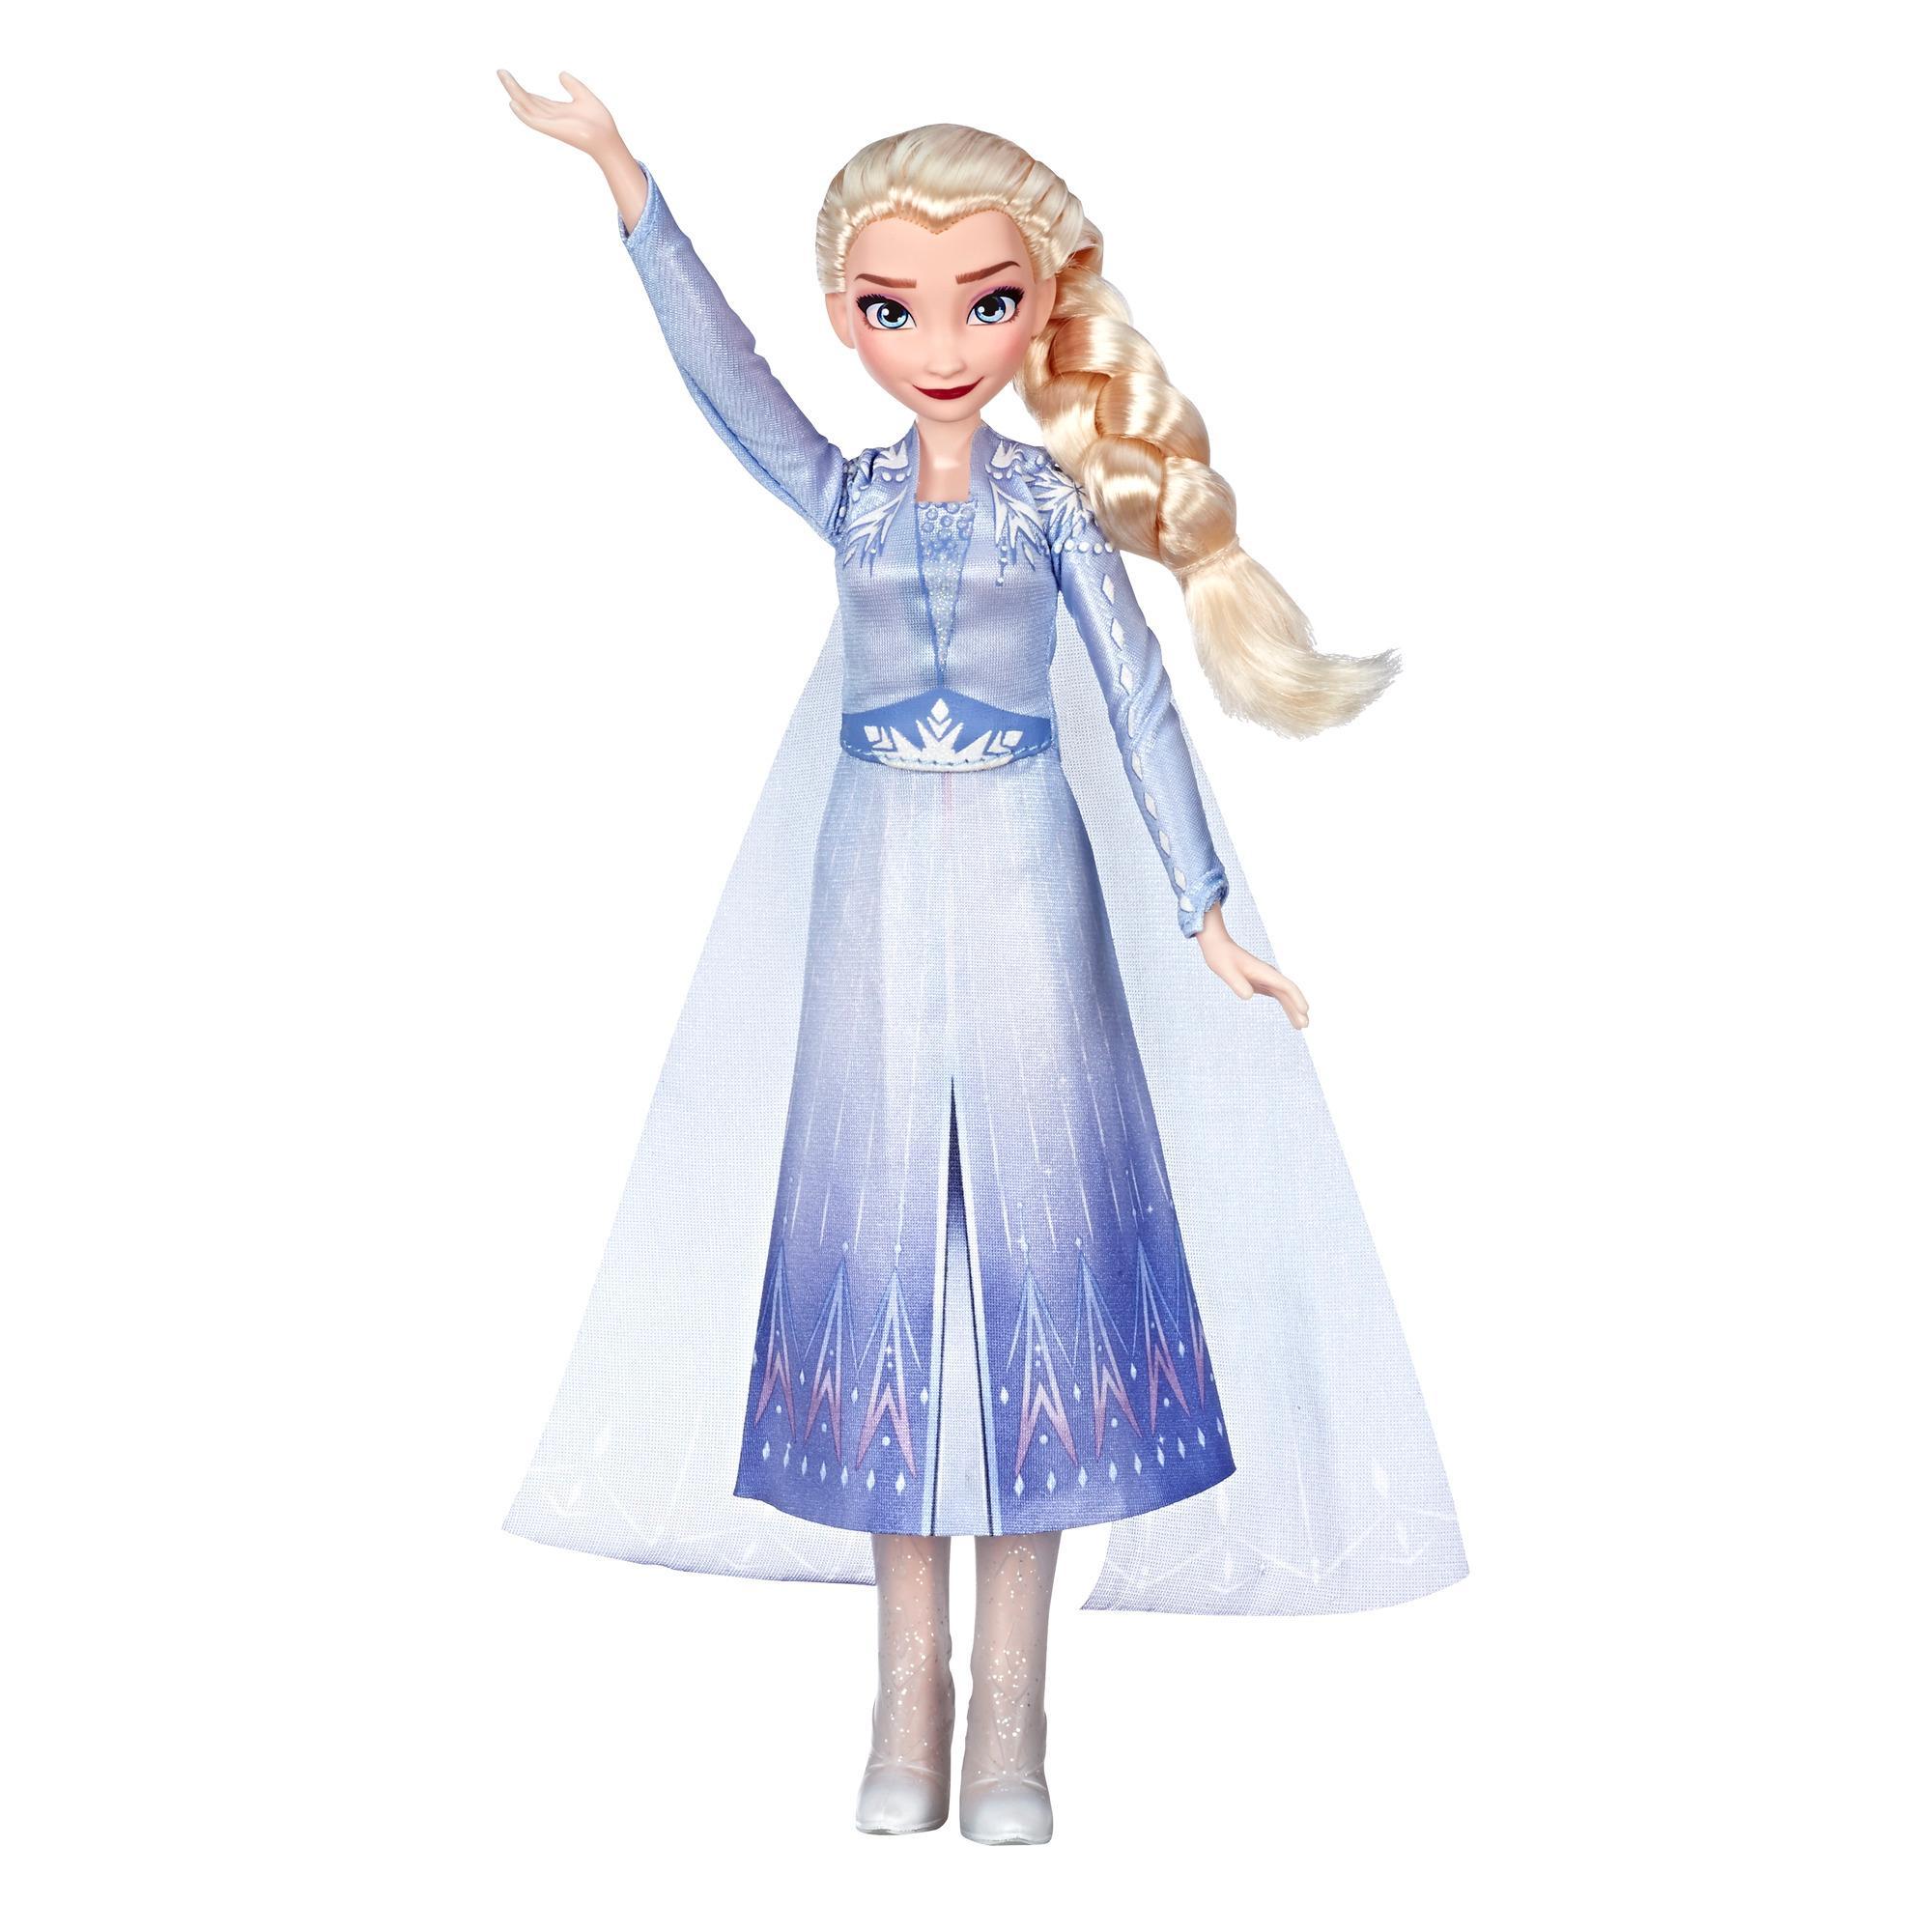 Die Eiskönigin 2 - Singende Elsa